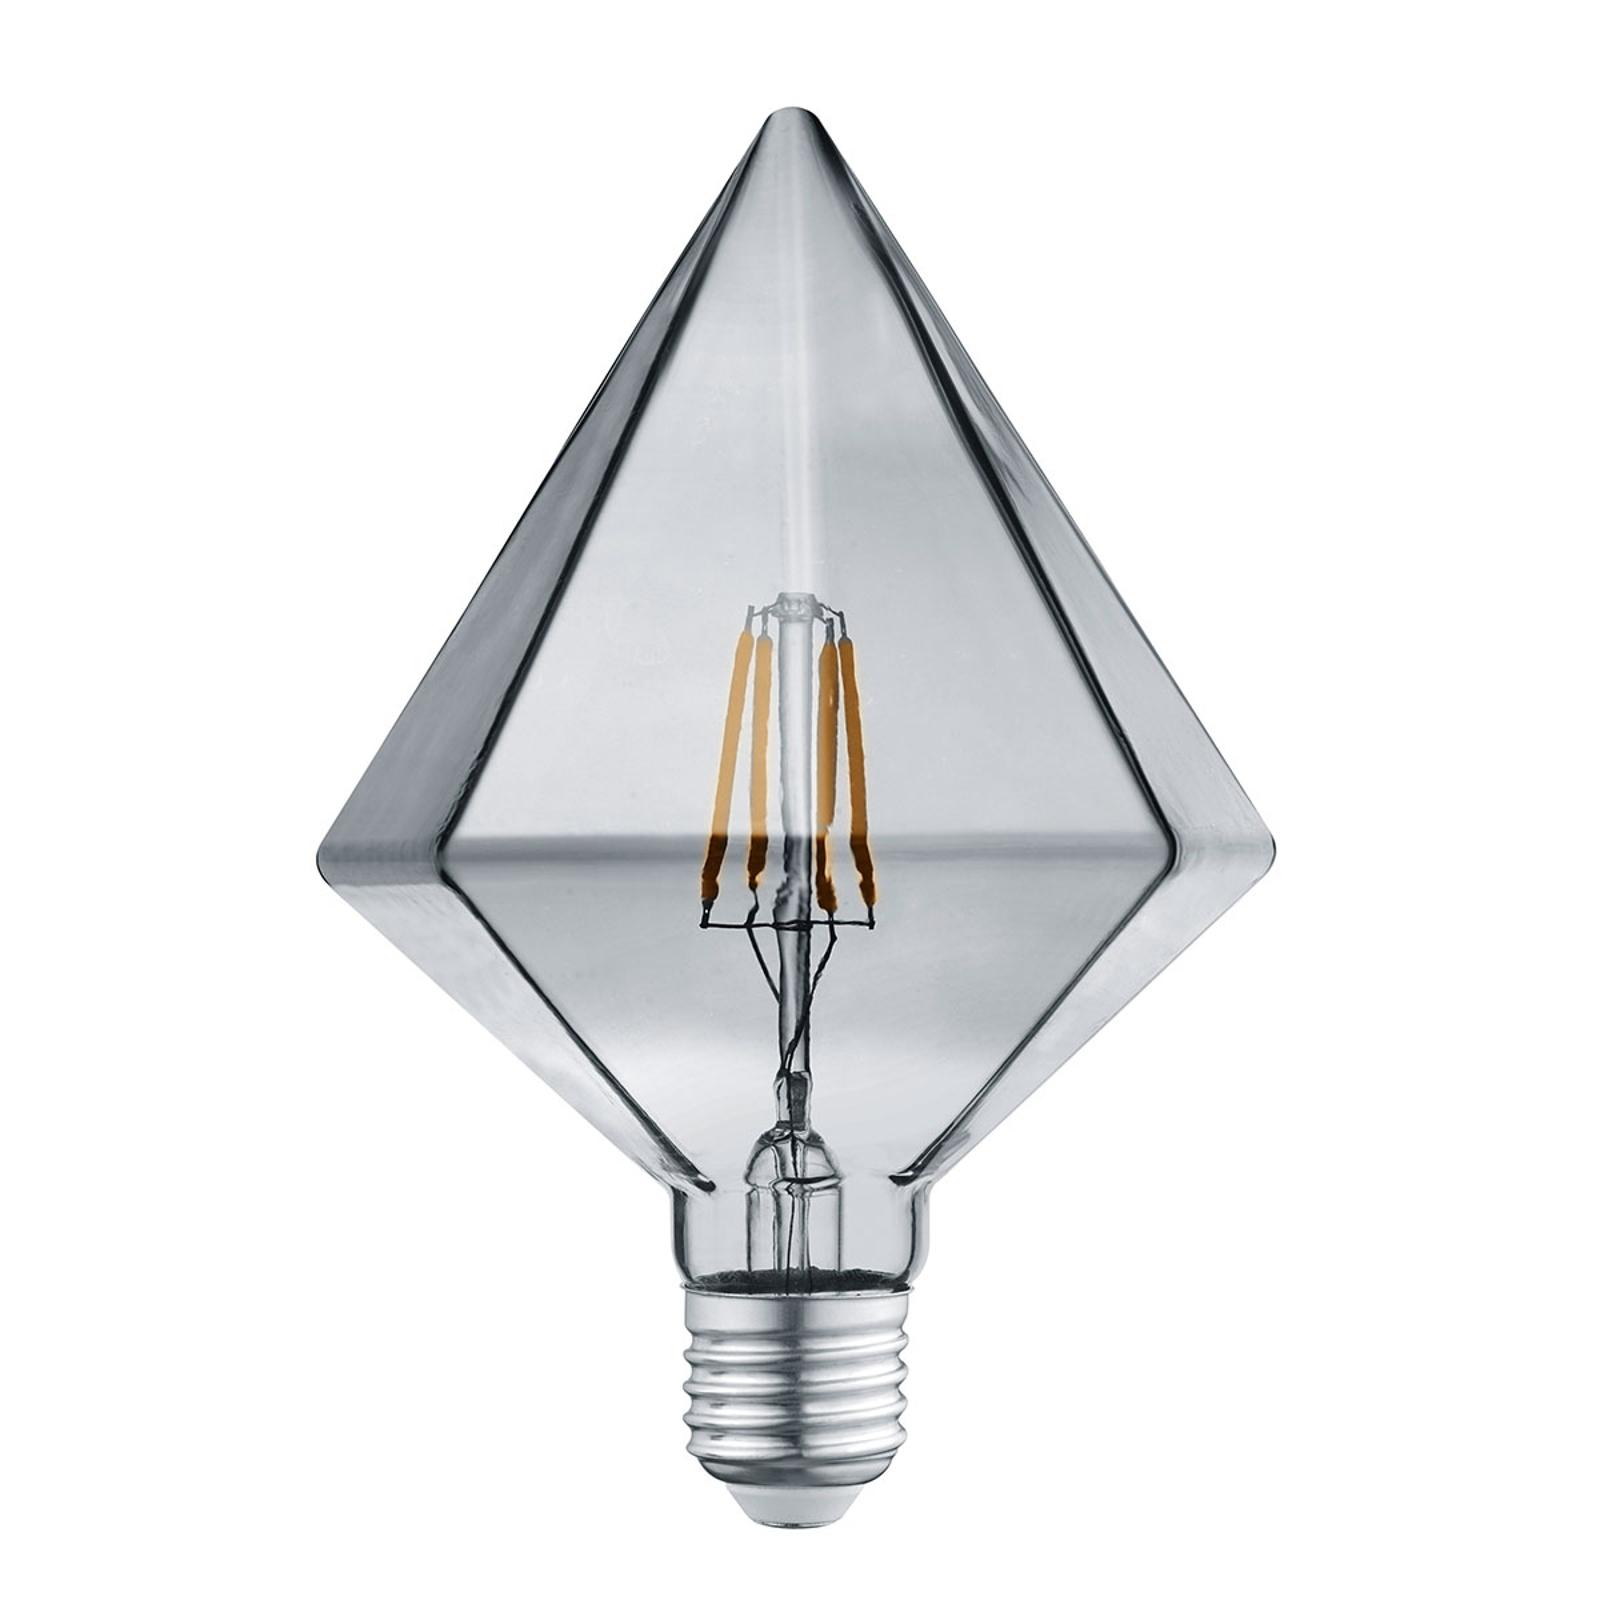 LED-pære E27 4 W 3000K diamant røykfarget